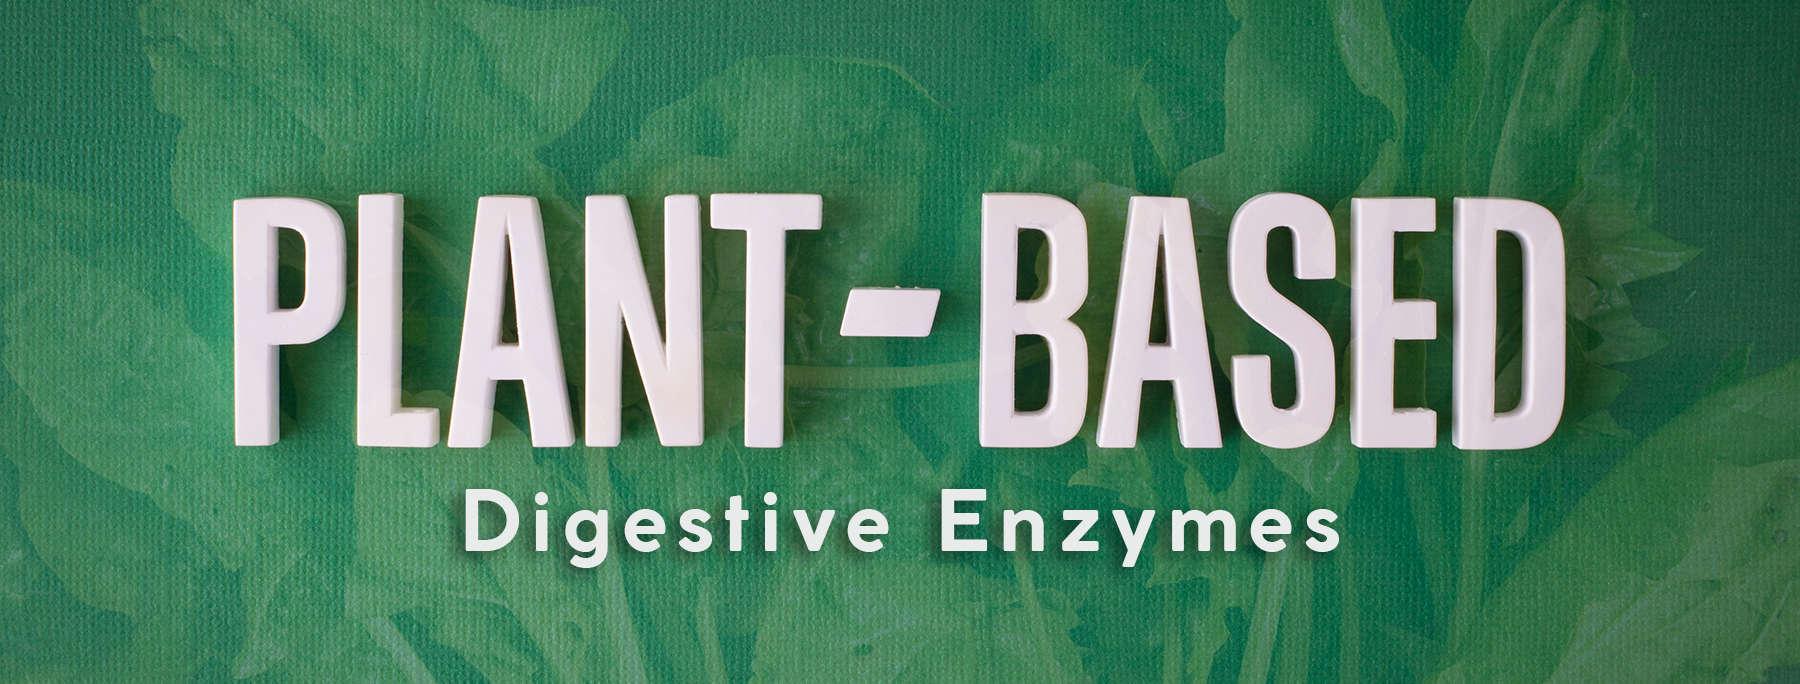 plant-based